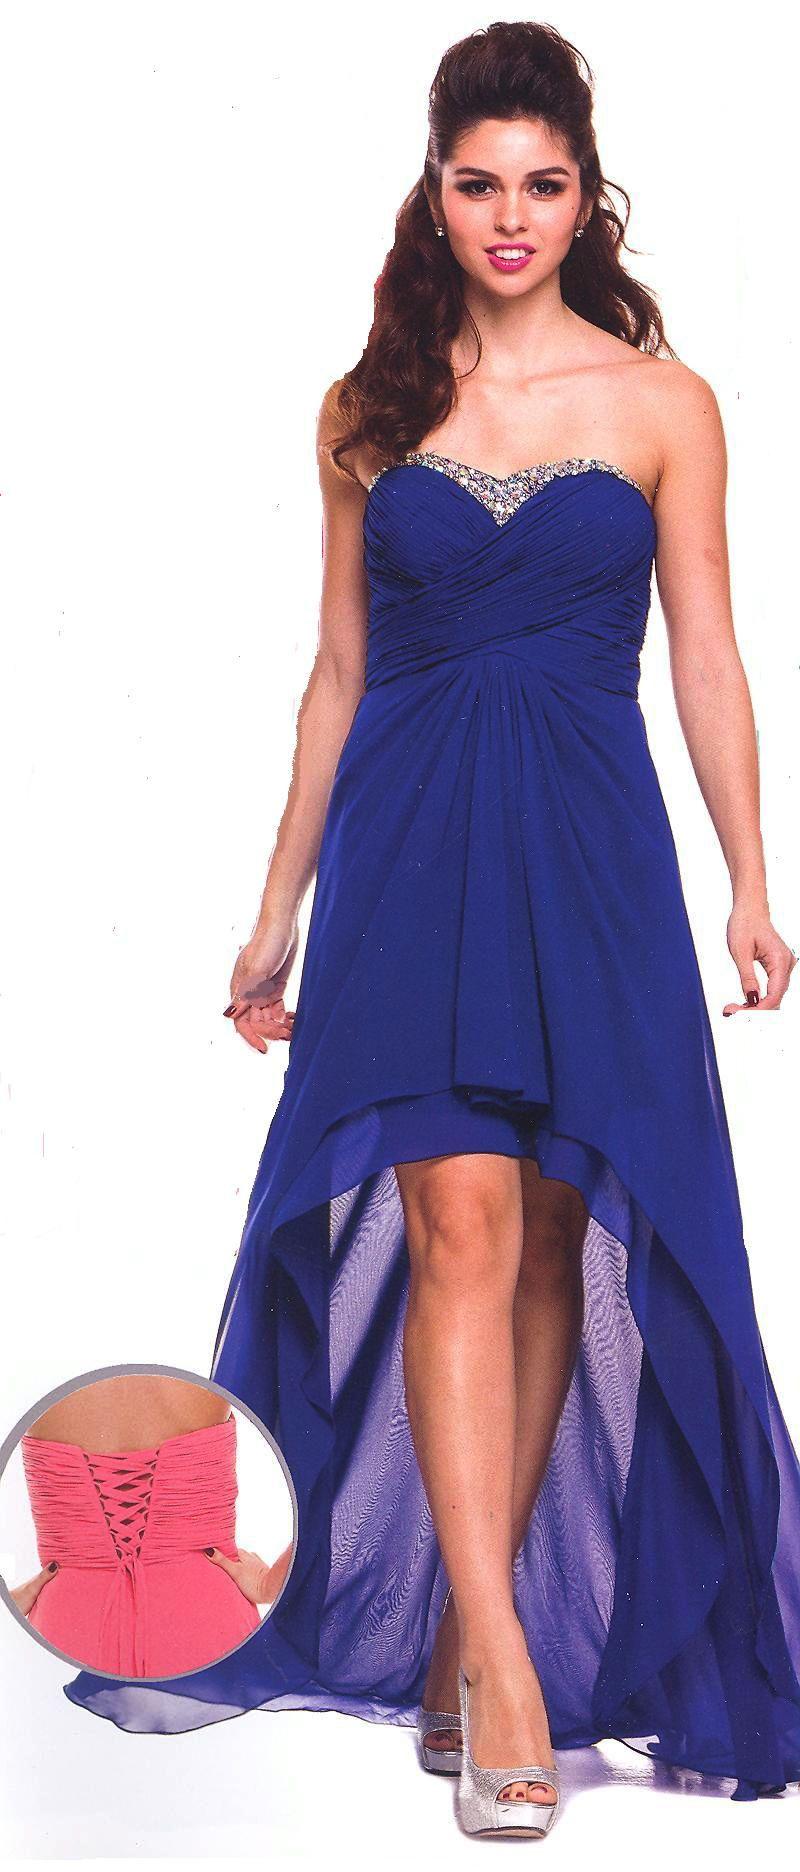 Bridesmaid dressesbrprom dresses under 100br575brhigh low bridesmaid dressesbrprom dresses under 100br575br ombrellifo Gallery